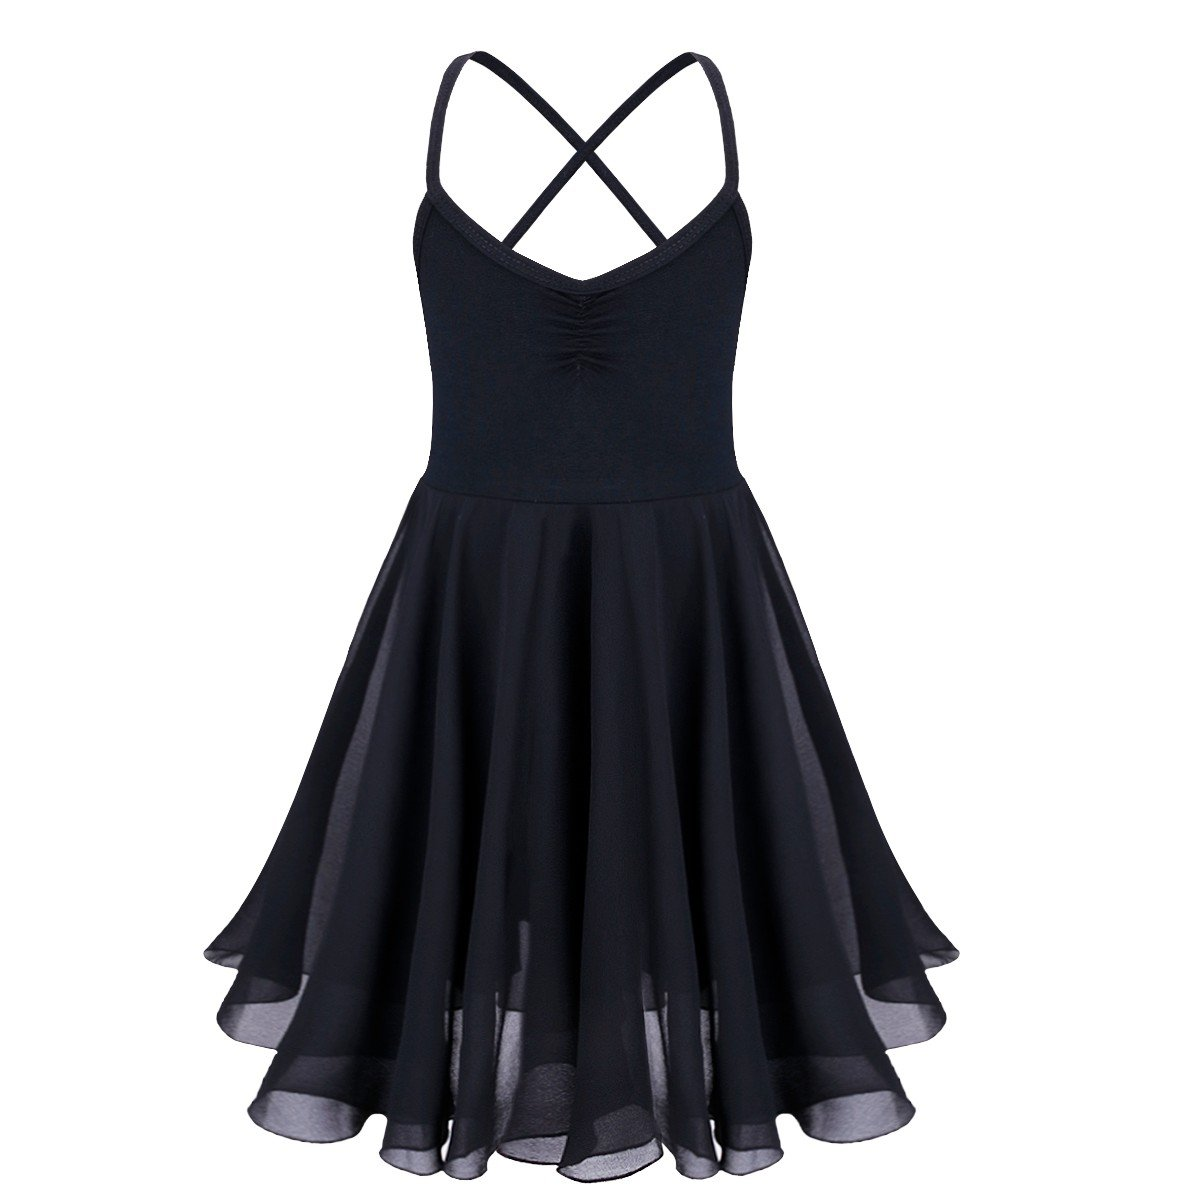 TiaoBug Girls Kids Ballet Dance Dress Leotard Gymnasitcs Tutu Skirt Ballerina Outfit Lyrical Dancewear Costume